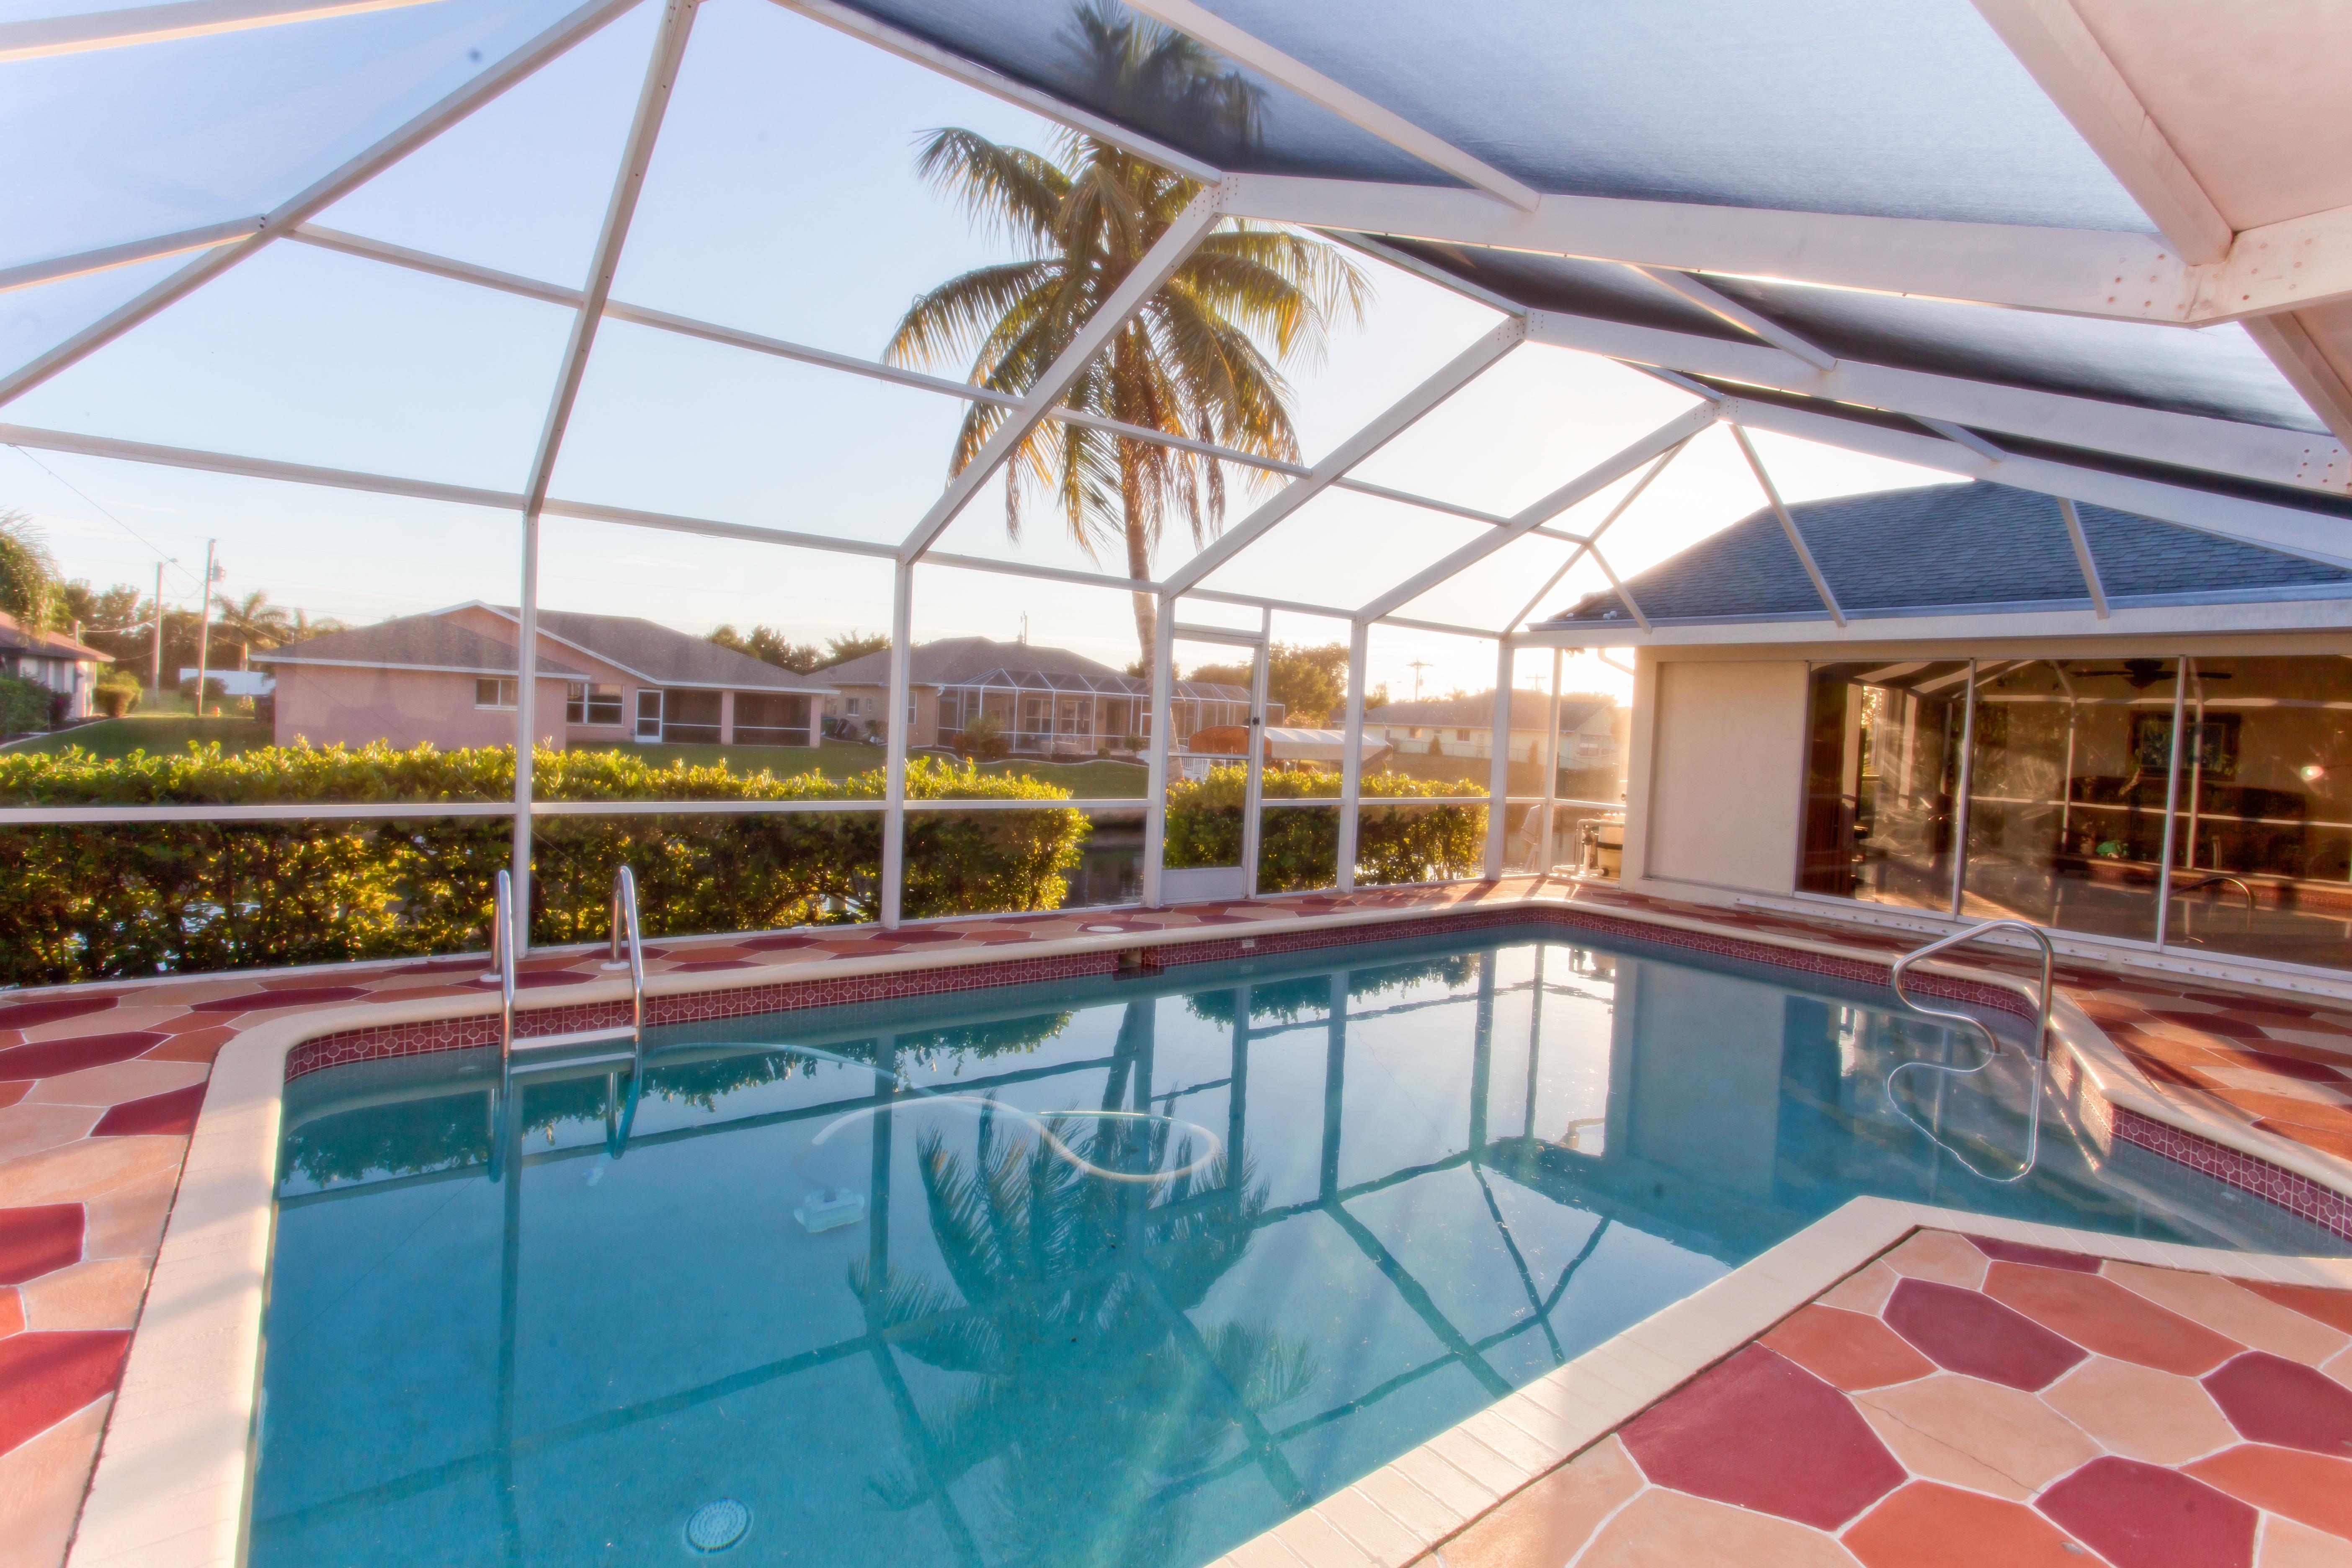 Pool Home - Gulf Access